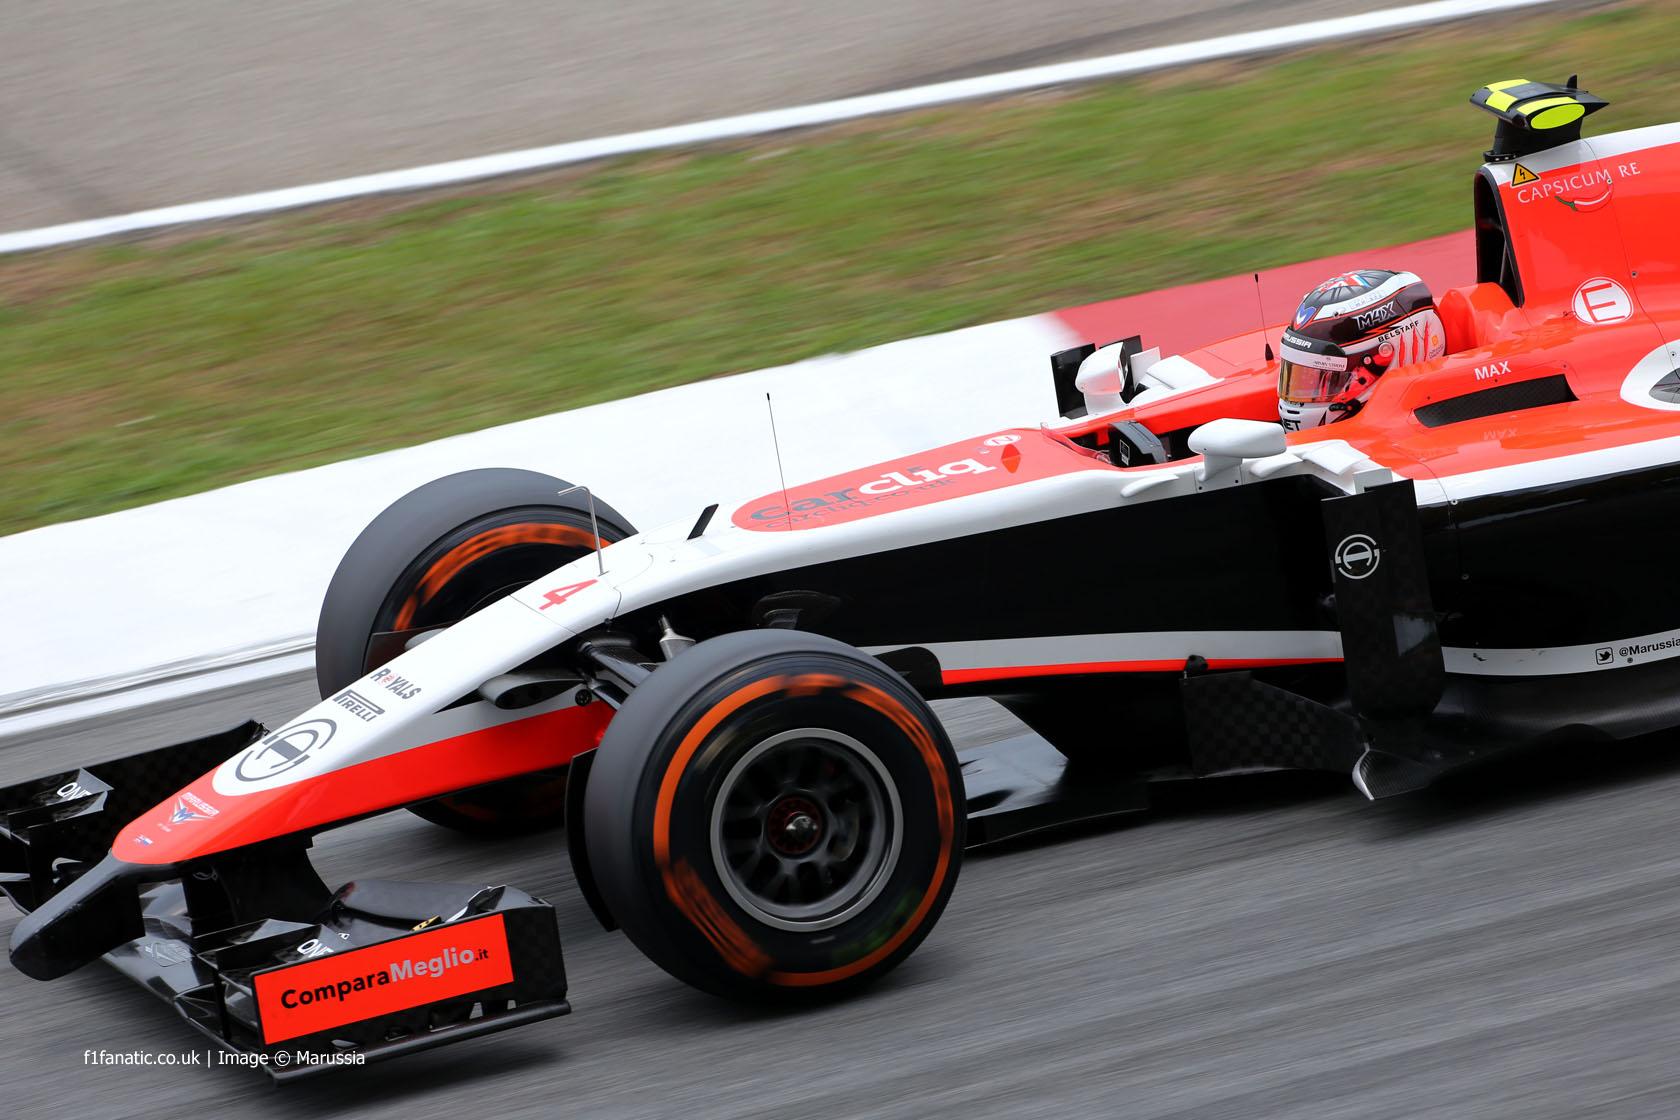 Max Chilton, Marussia, Sepang International Circuit, 2014